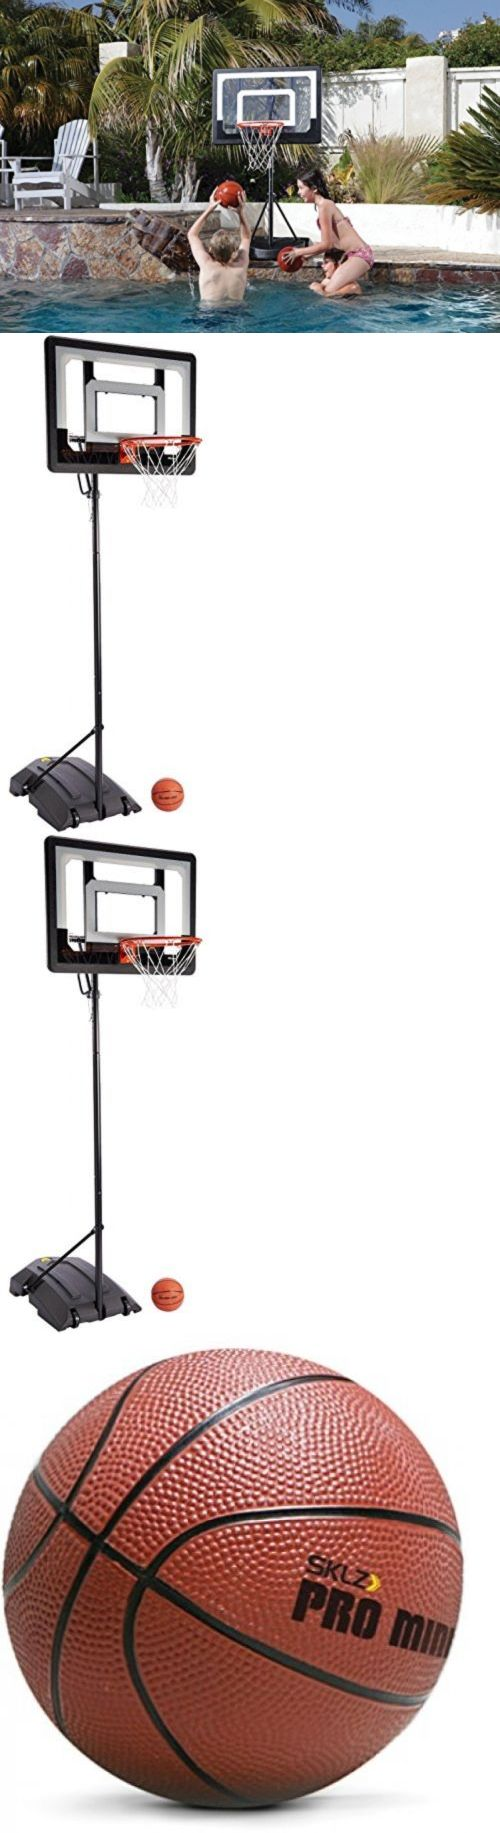 Best 25 portable swimming pools ideas on pinterest - Swimming pool basketball hoop costco ...